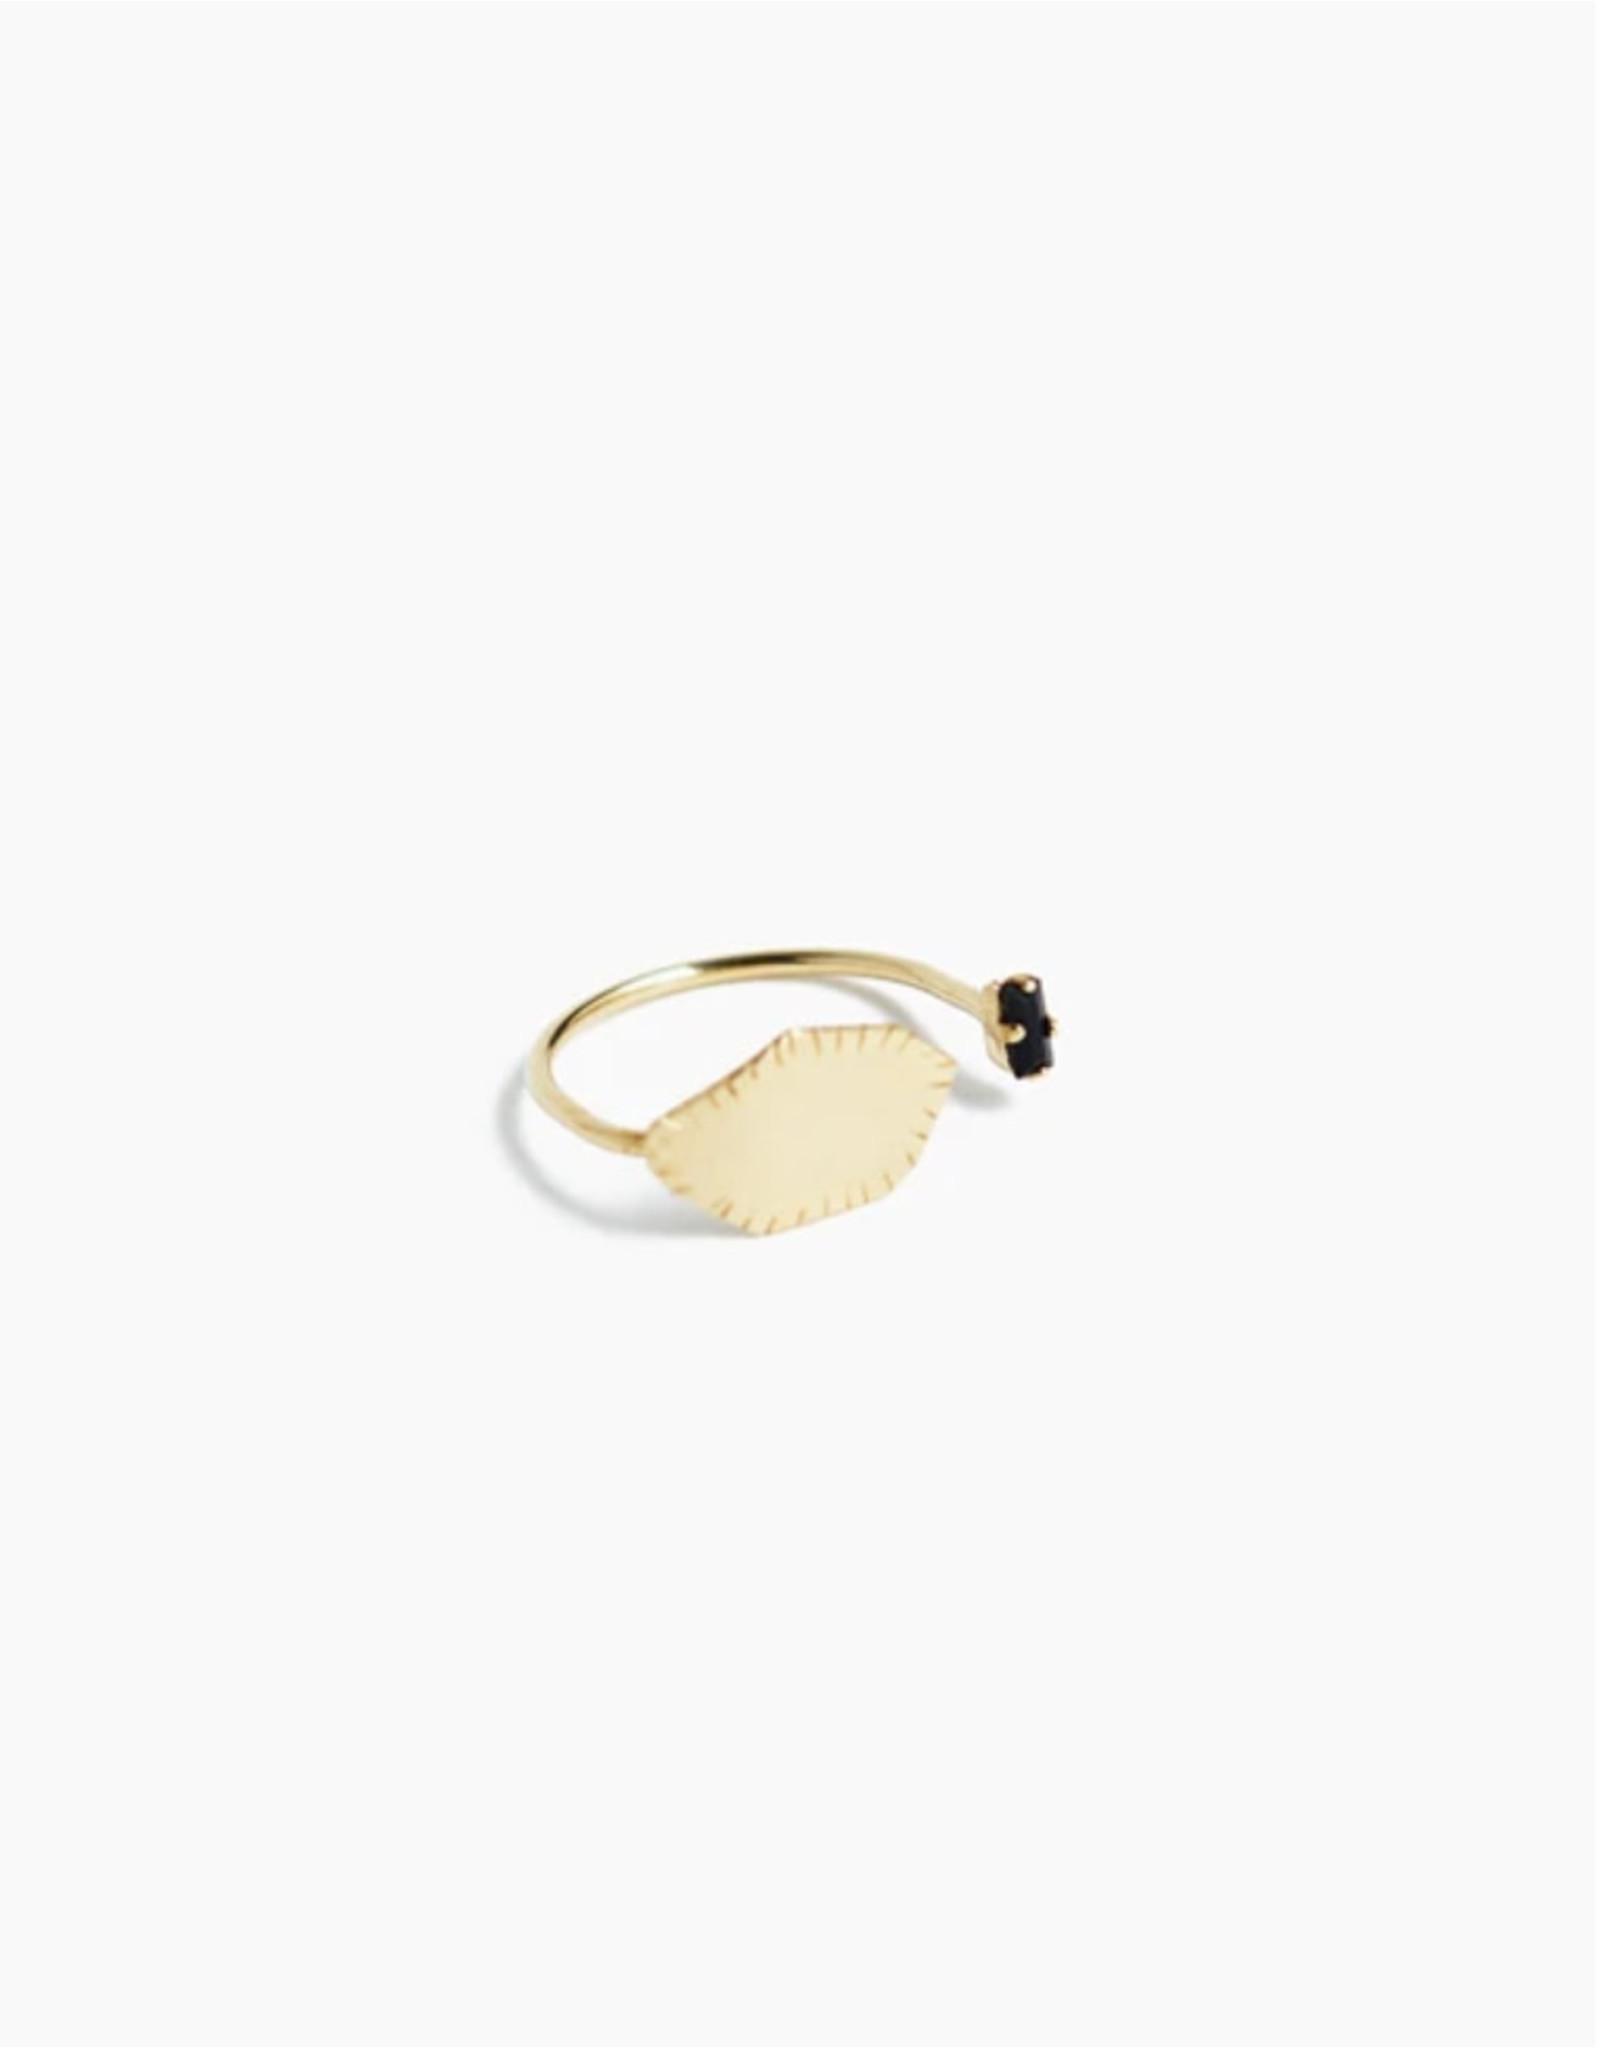 Judith Benita Ring Myrrhe  - M55 - Swarovski  zwart  -  Messing Verguld